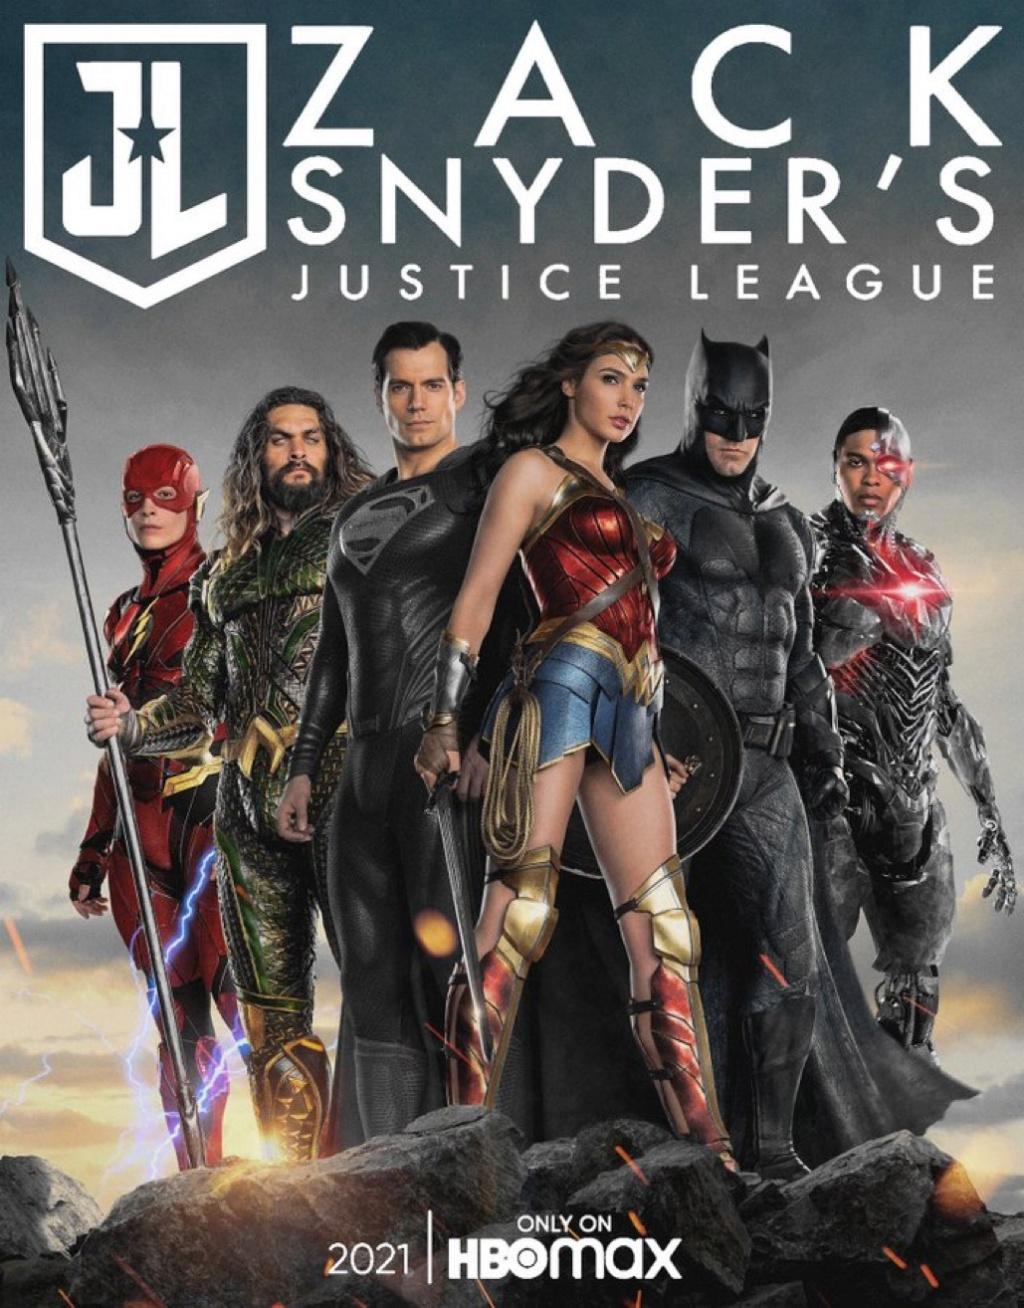 DC Comics: Batman, Superman, Wonder Woman... Zack Snyder's Justice League. - Página 2 967b5c10